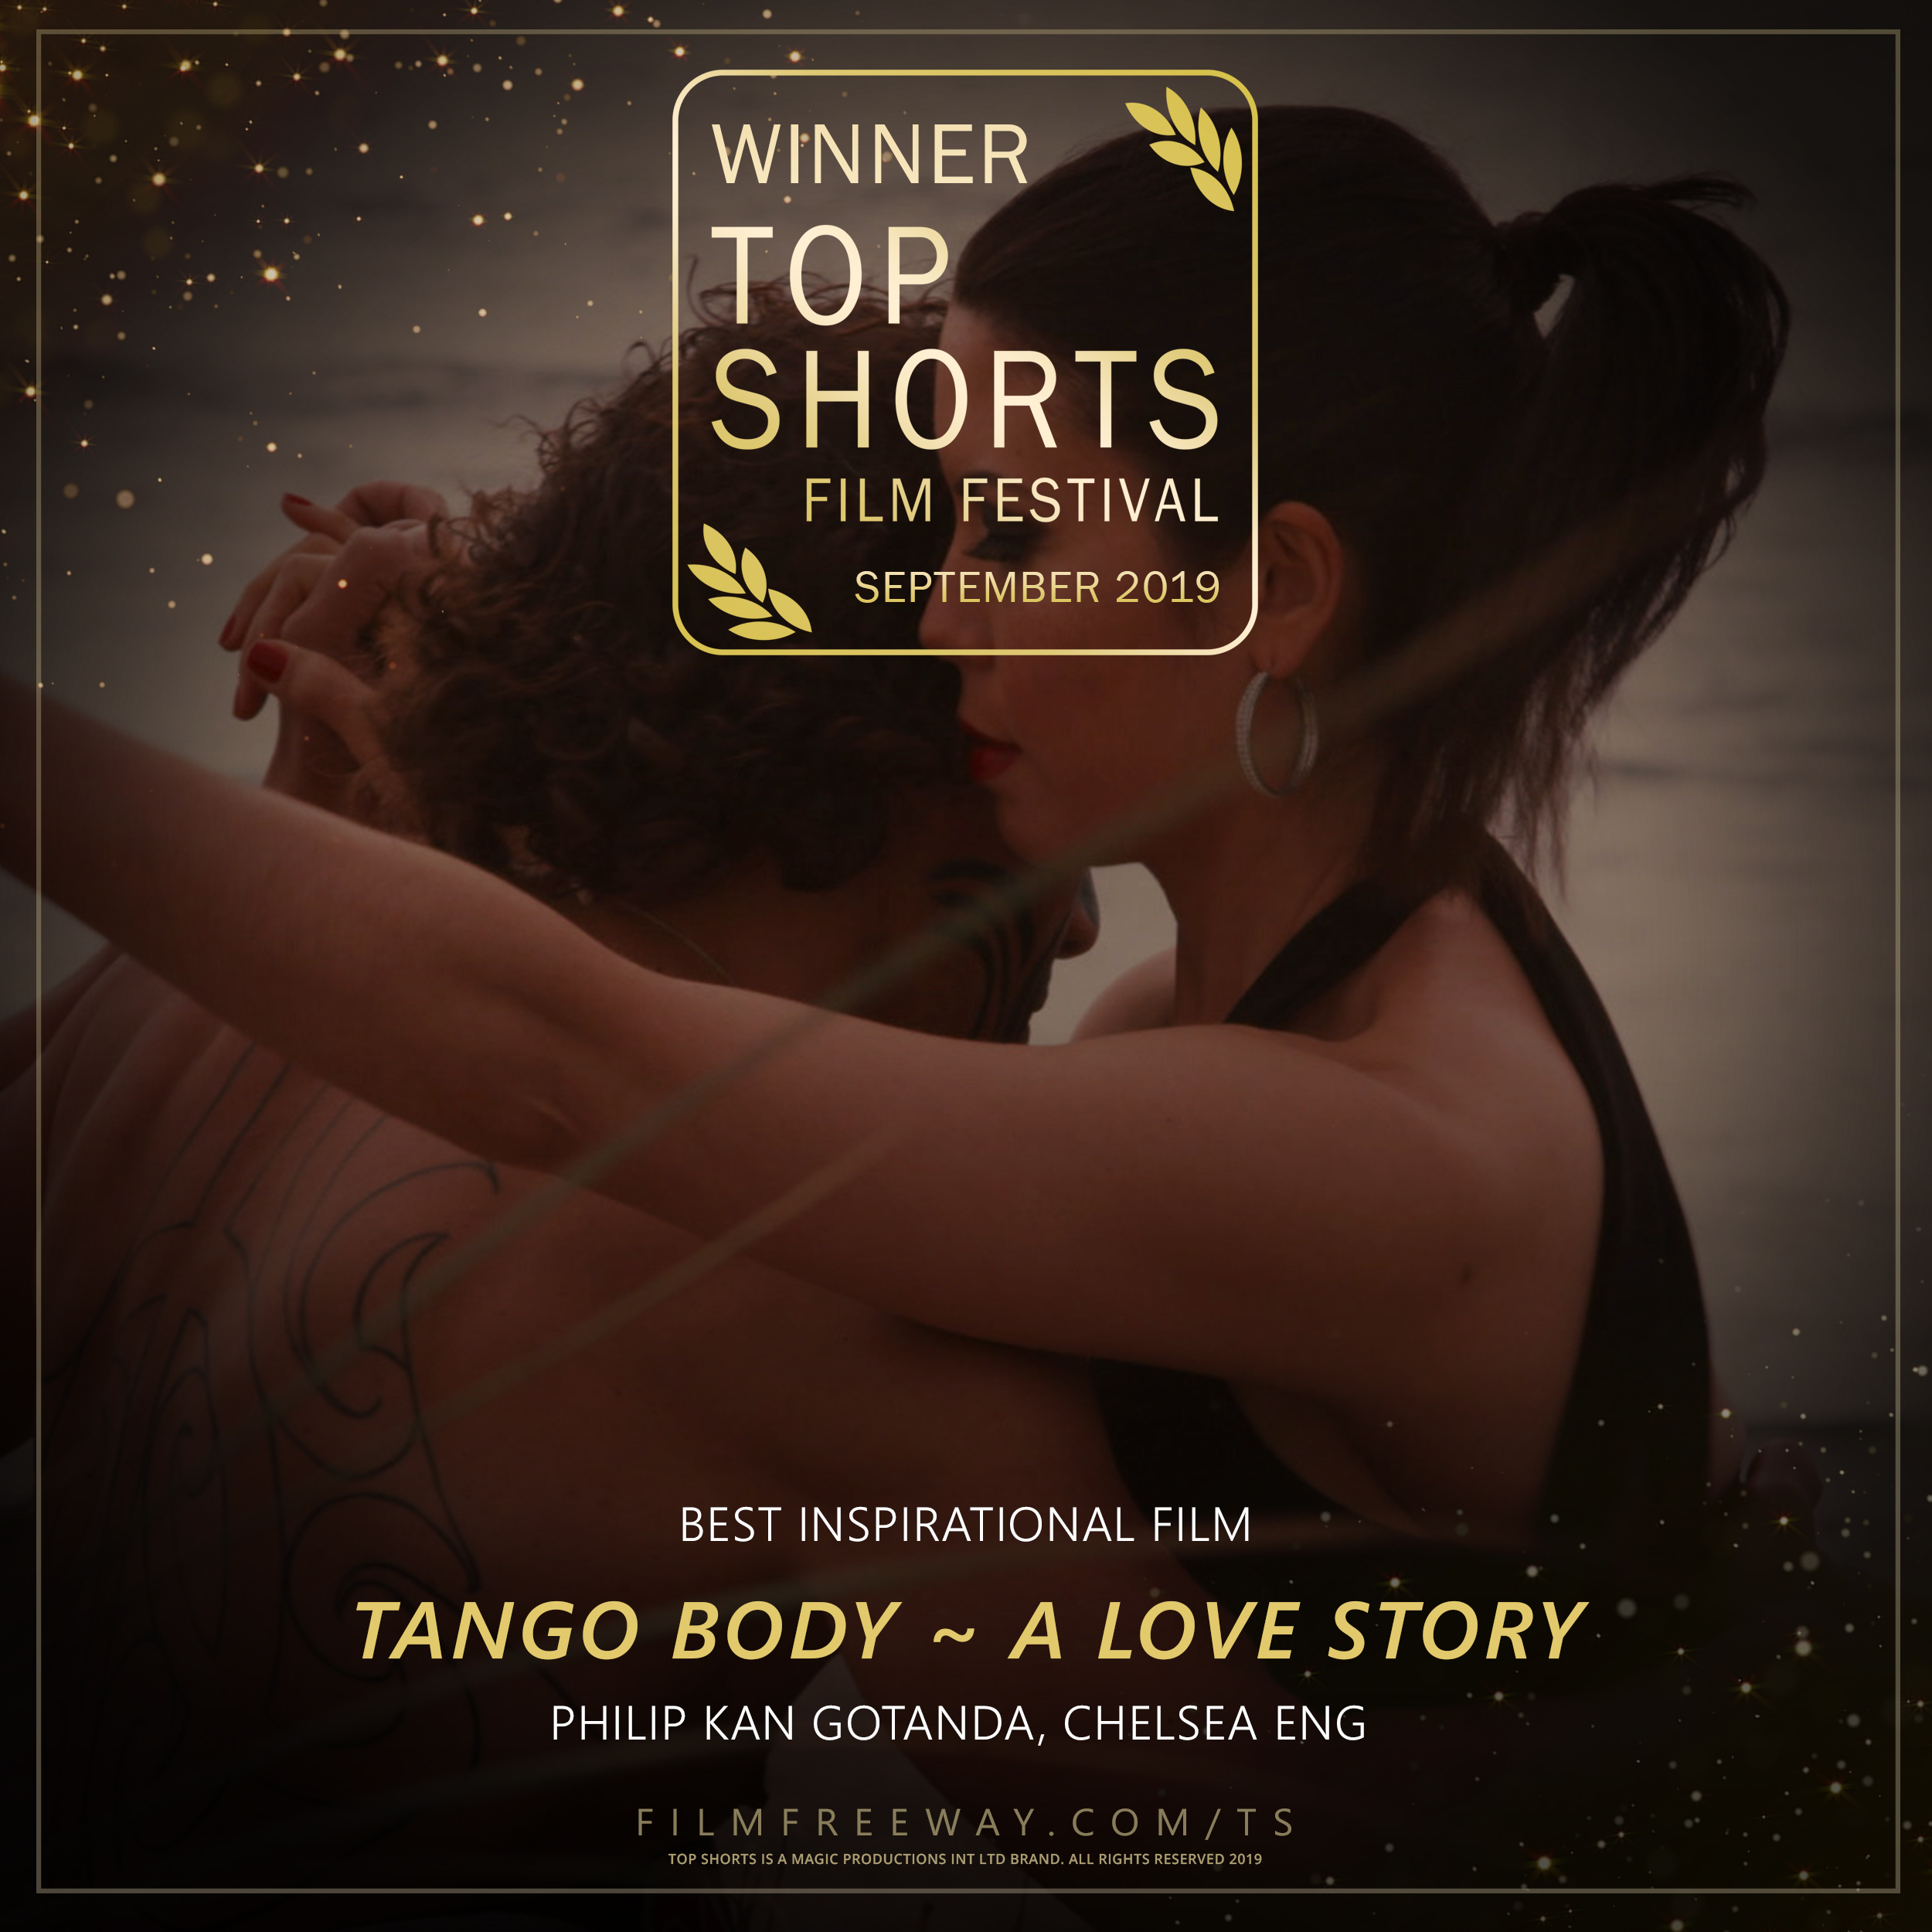 TANGO BODY ~ A LOVE STORY